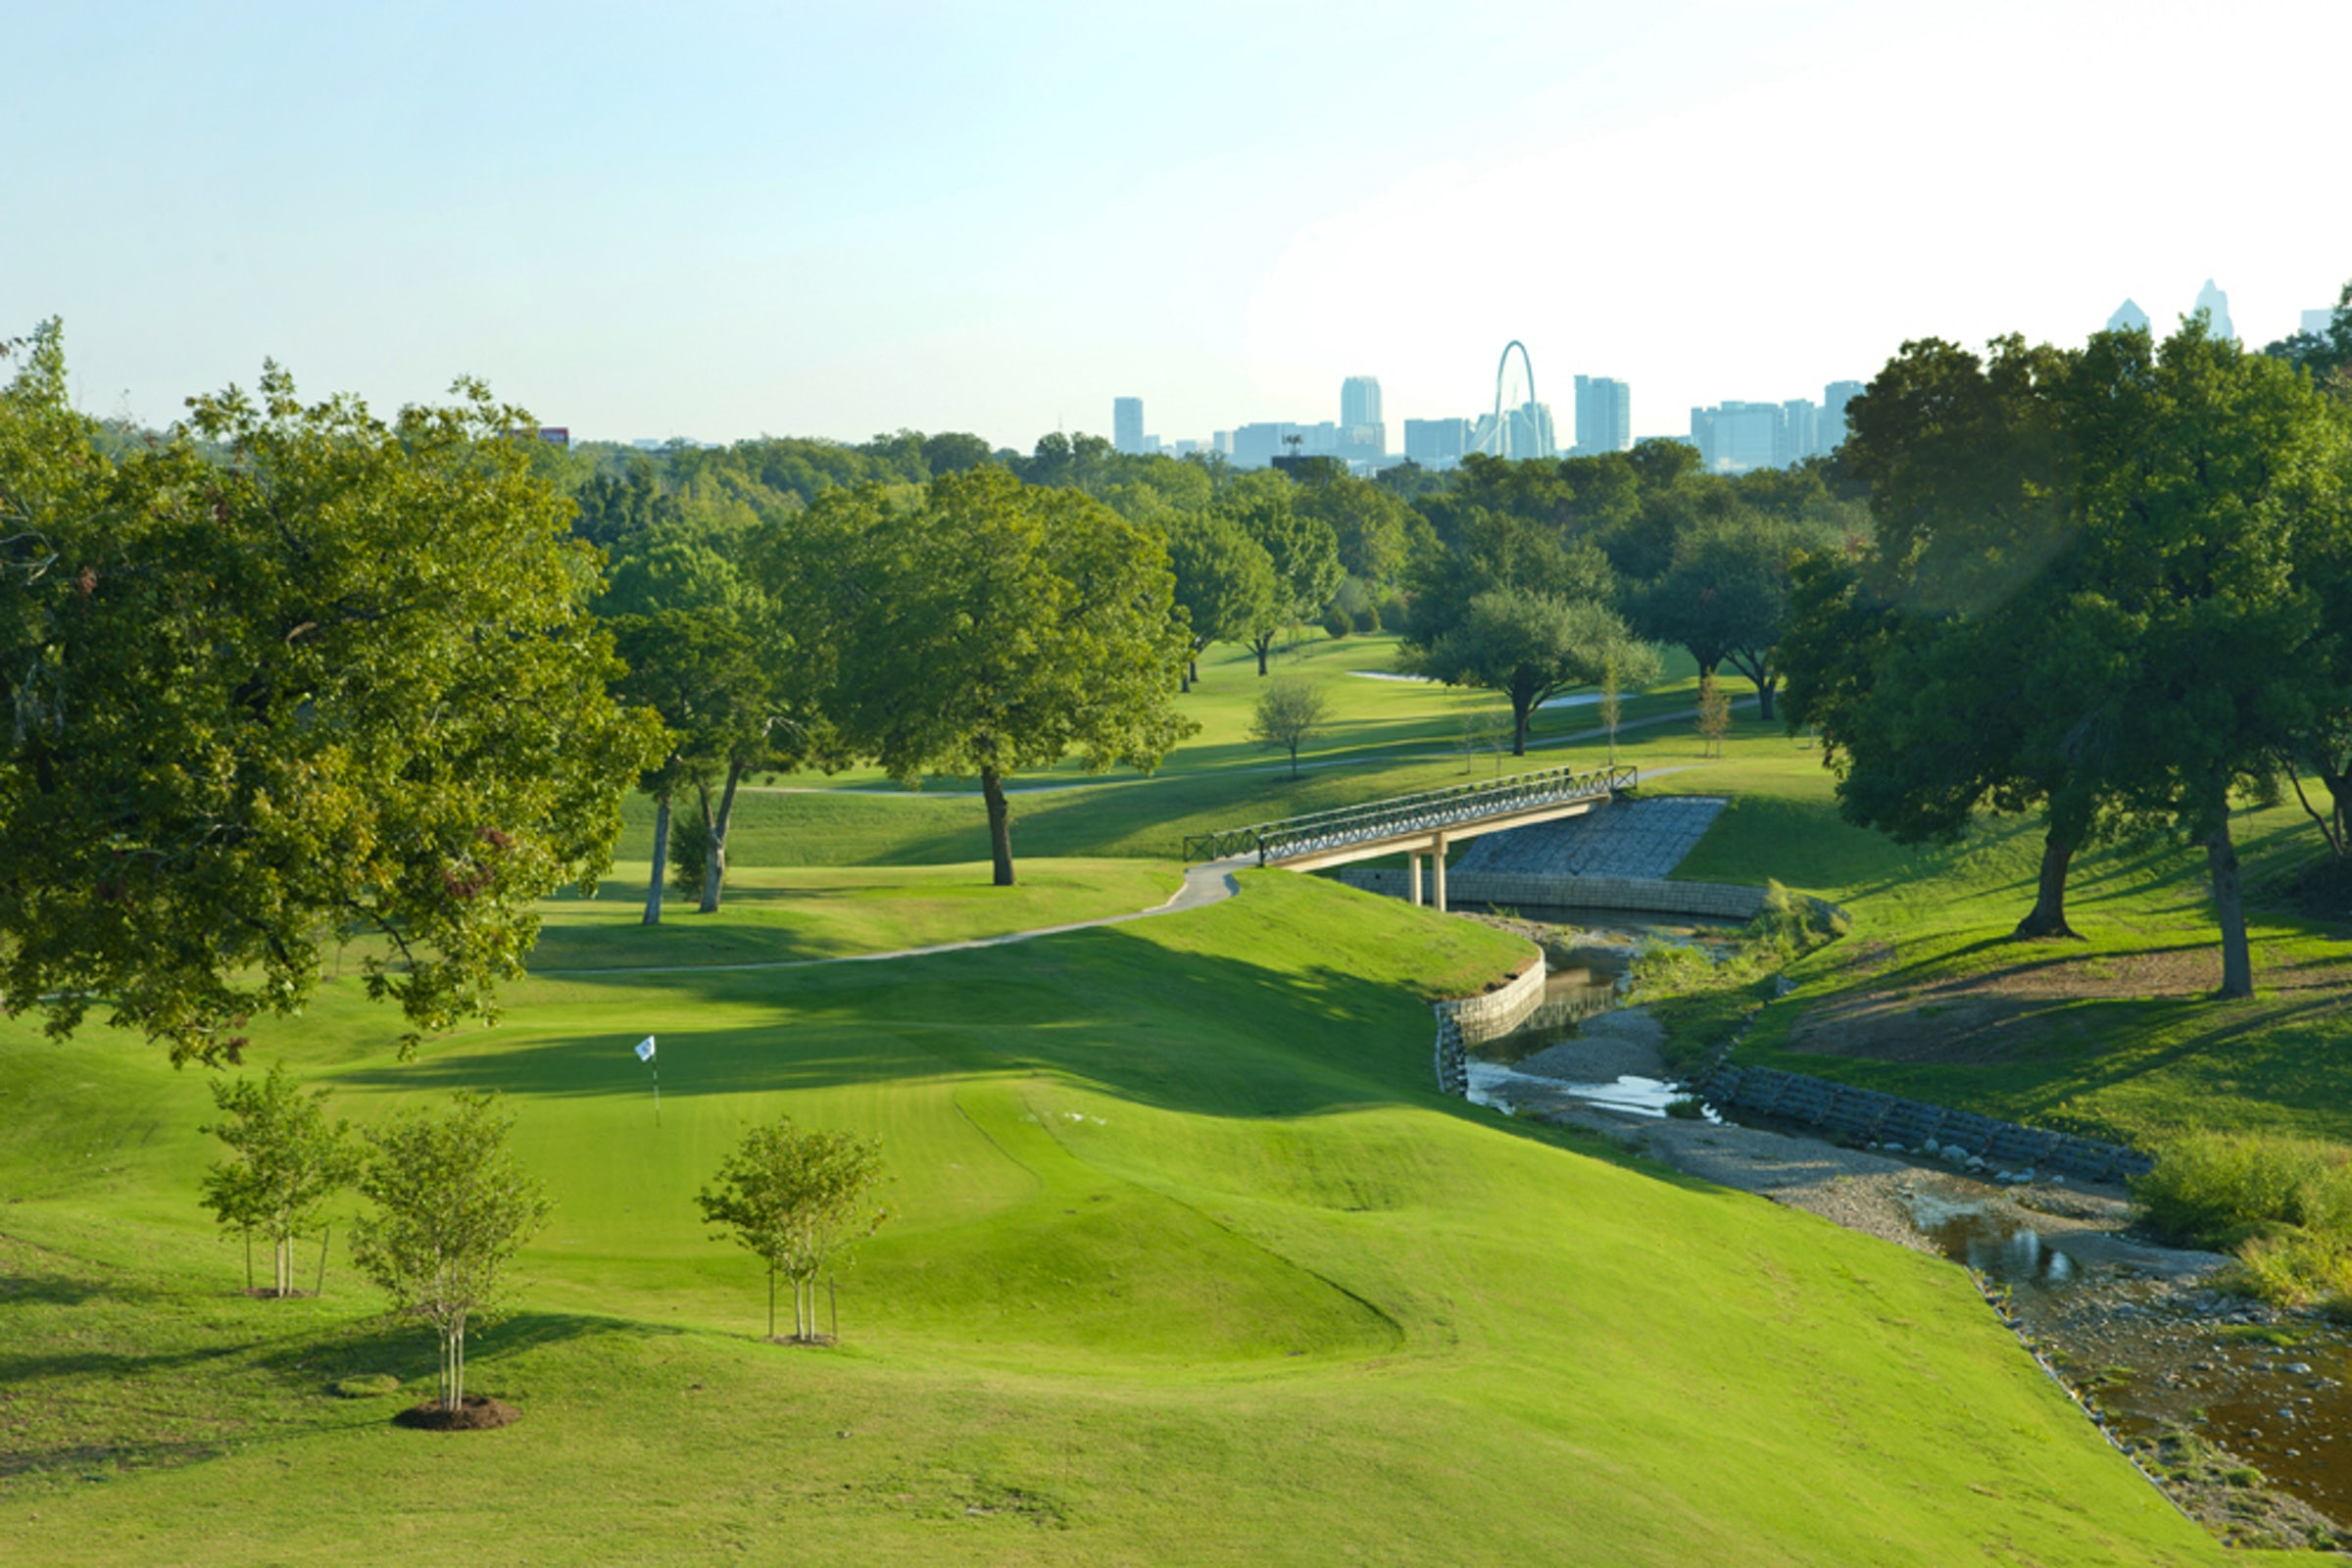 Stevens Park Golf Course in Beyond Dallas